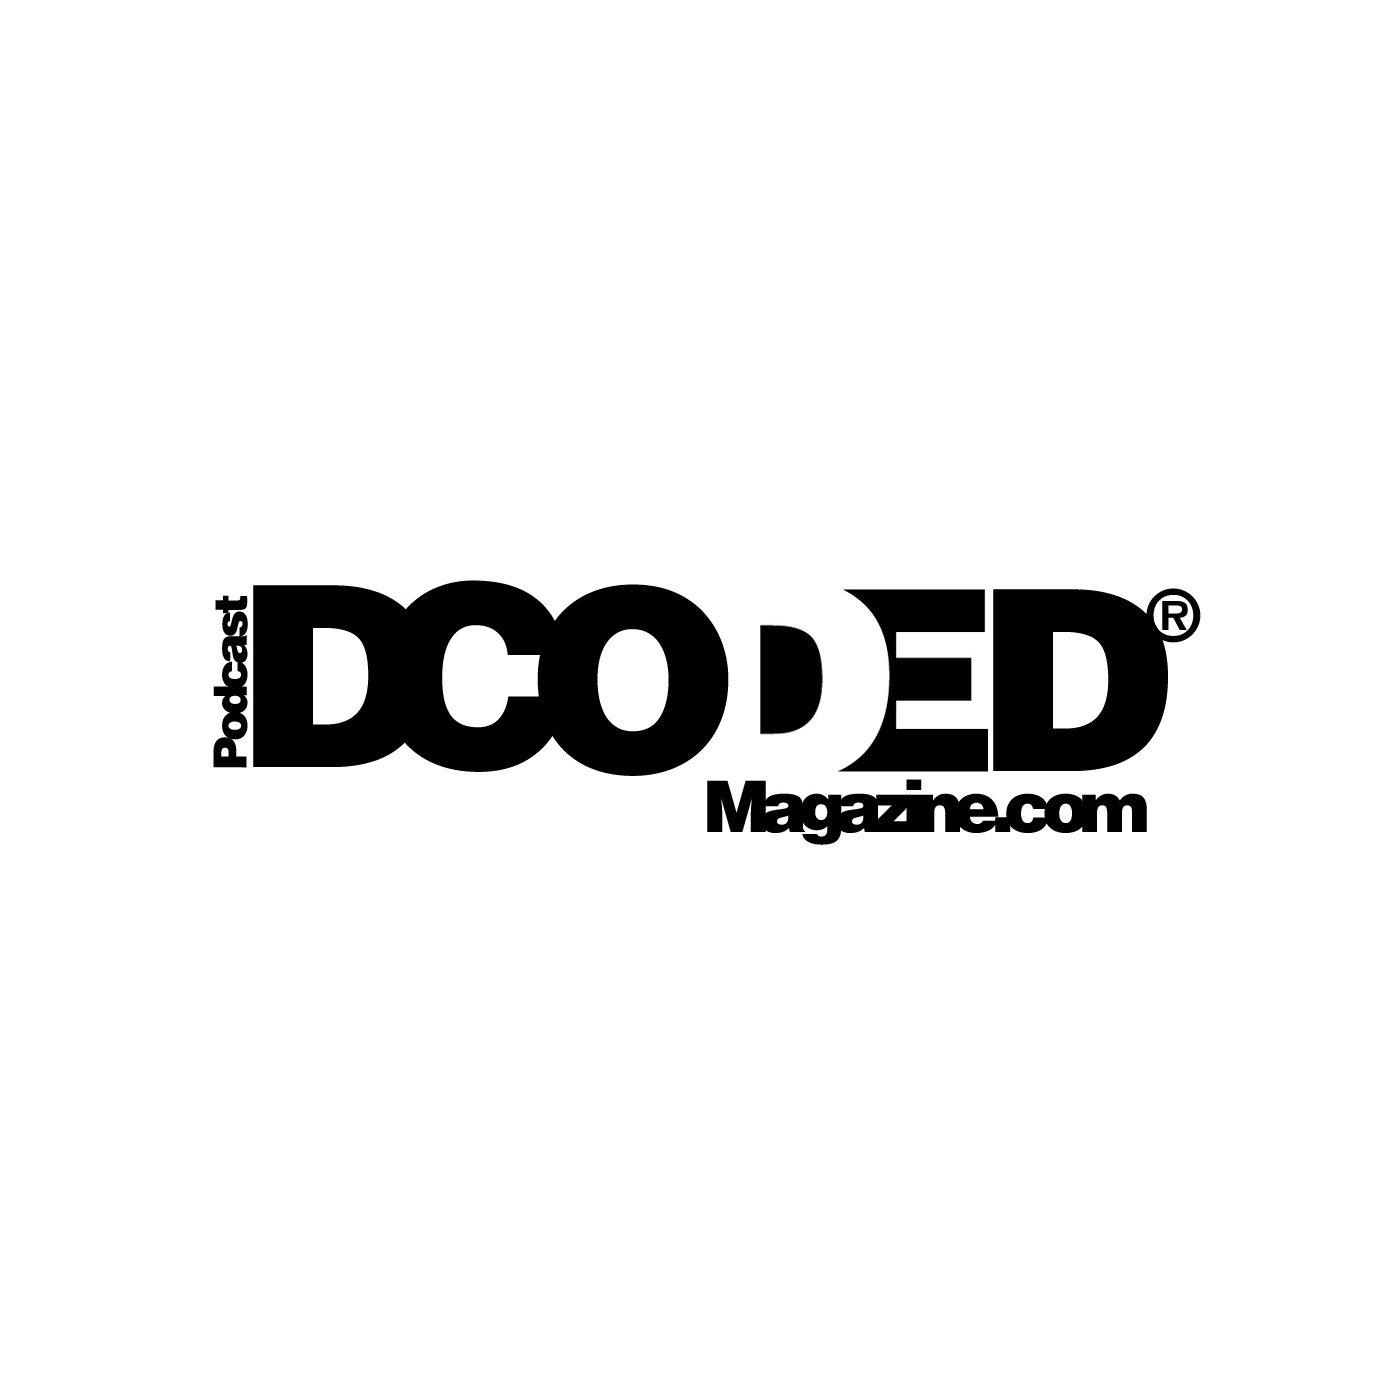 <![CDATA[DcodedMagazine Podcast]]>